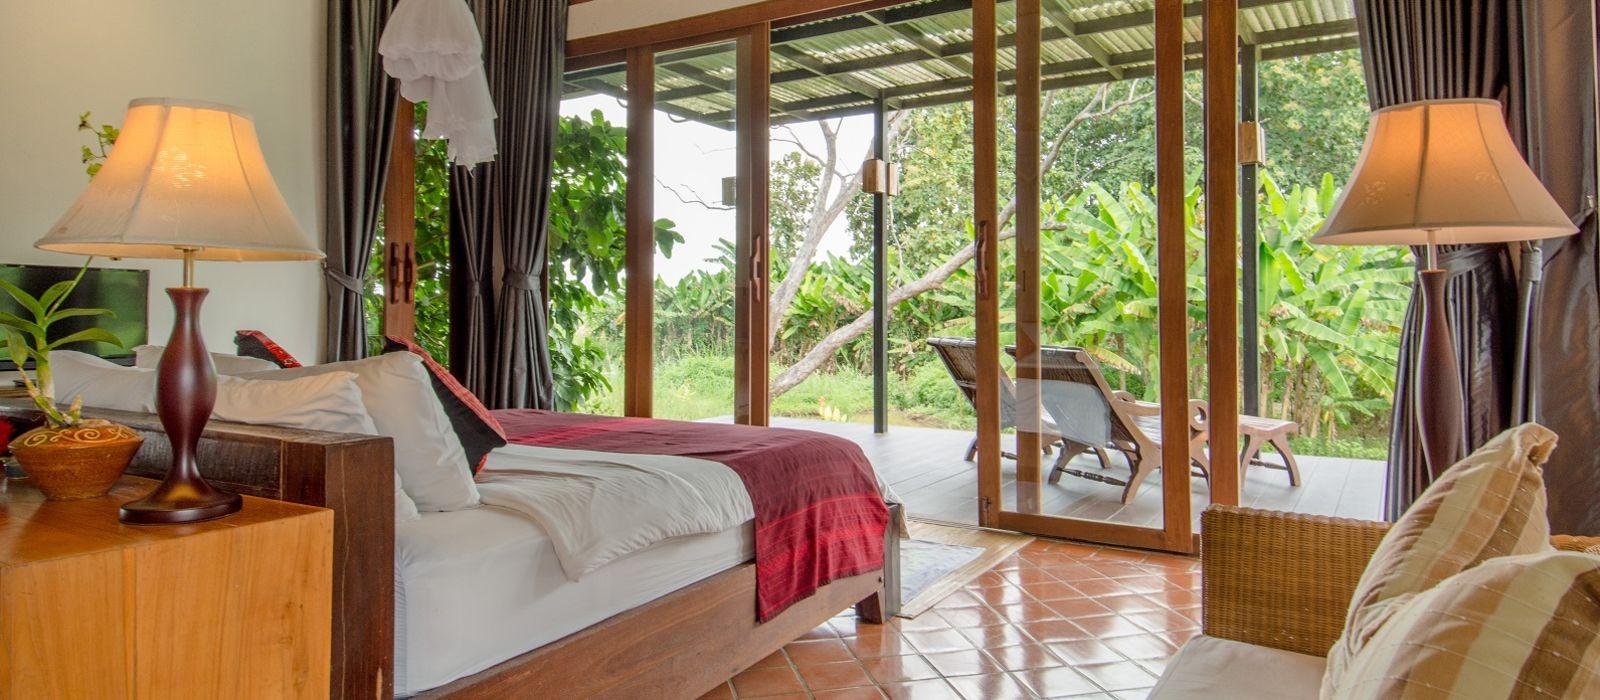 Hotel Manee Dheva Resort & Spa, Mae Chan Thailand